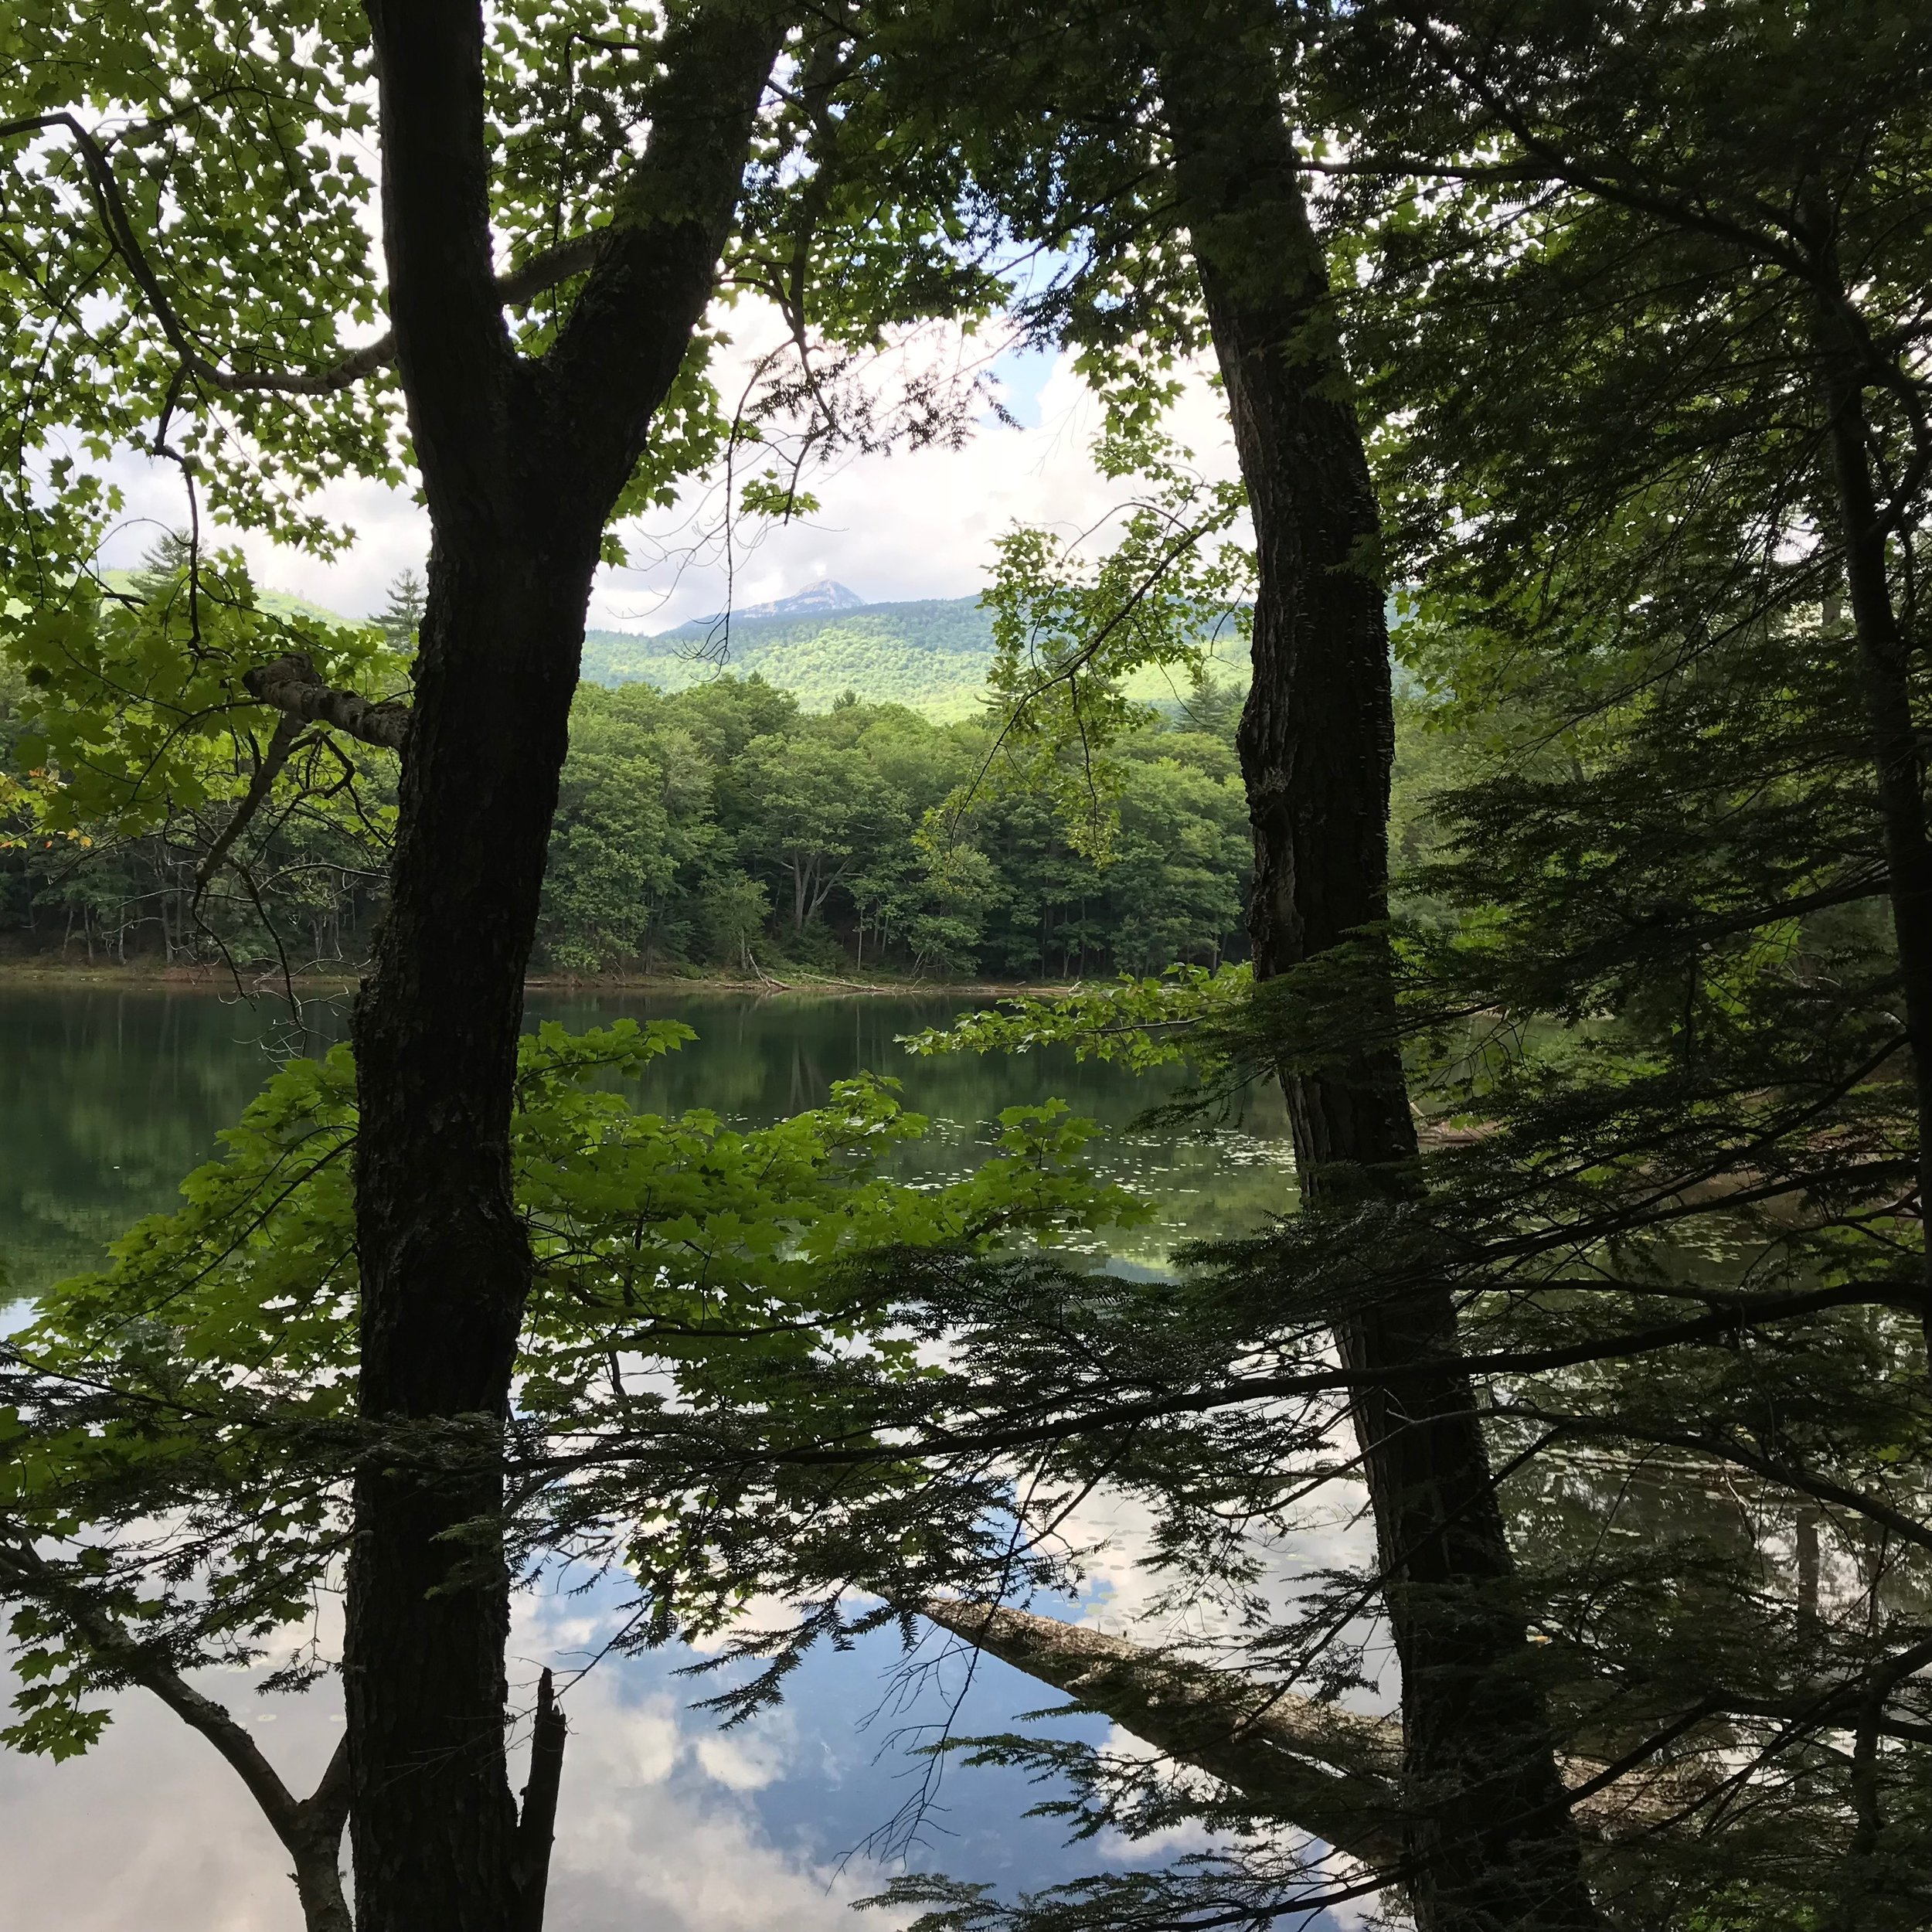 Mount Chocorua from Heron Pond